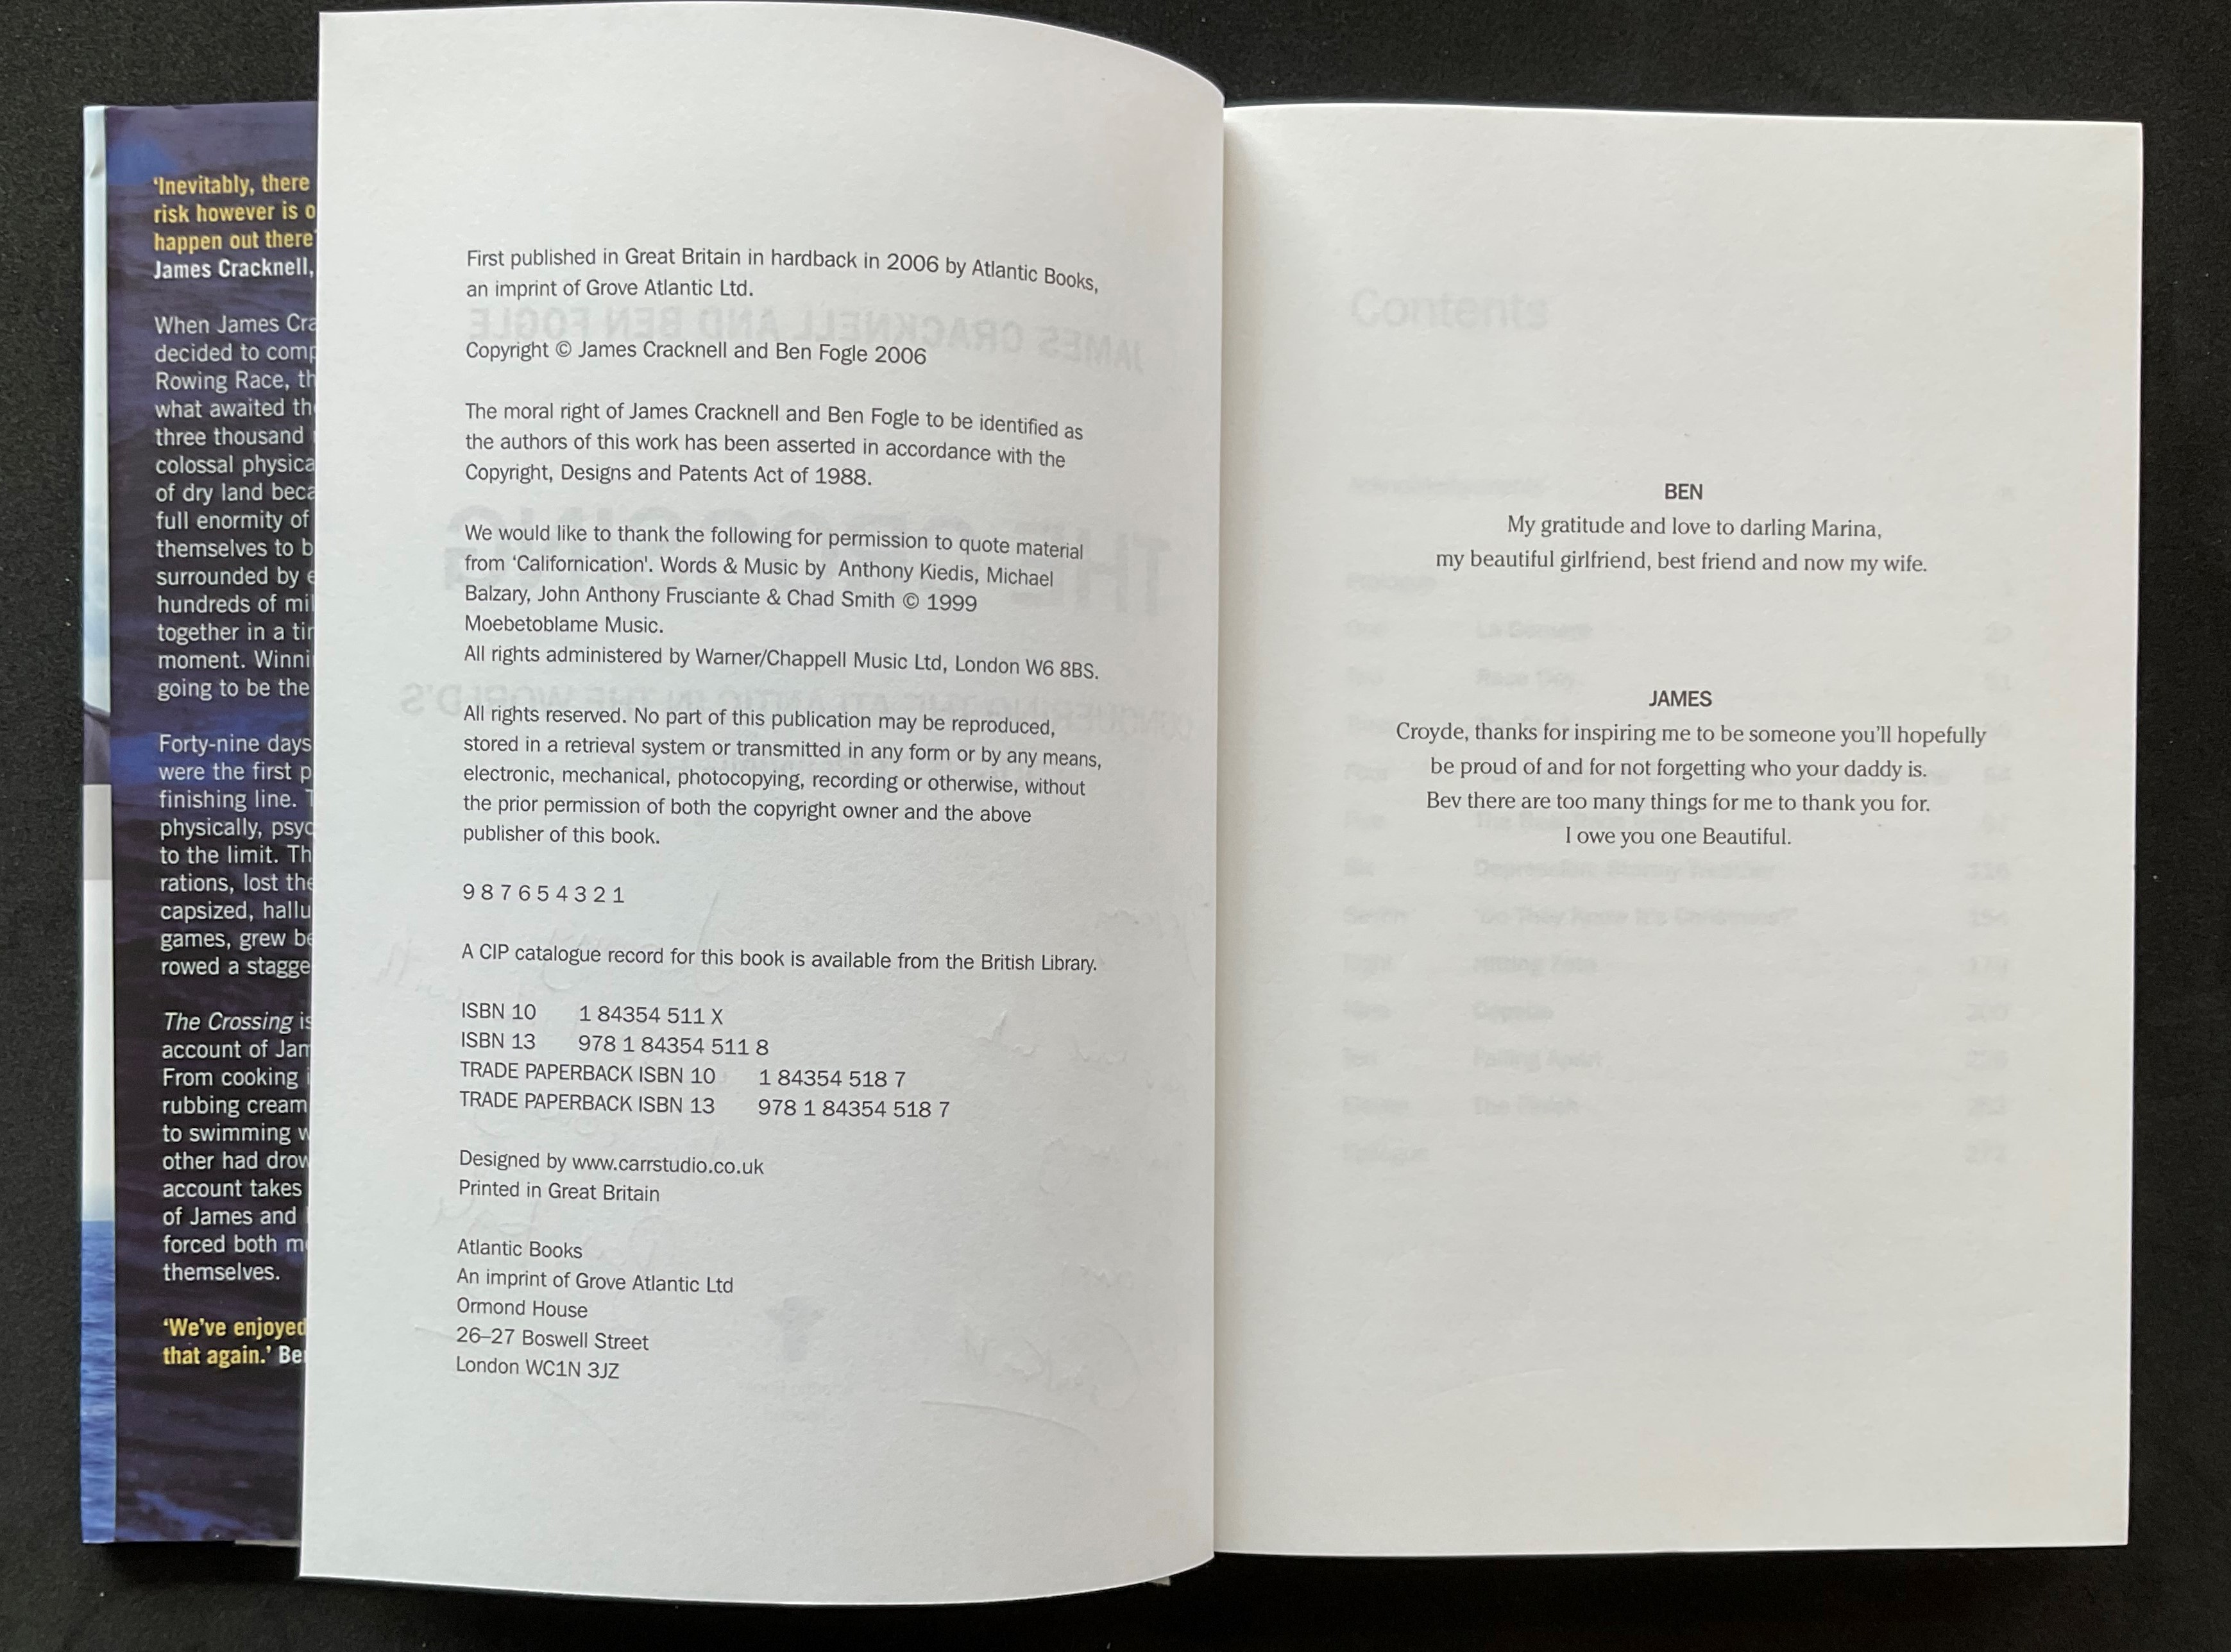 Athlete James Cracknell and Broadcaster Ben Fogles book The Crossing, signed hardback copy, - Image 3 of 3